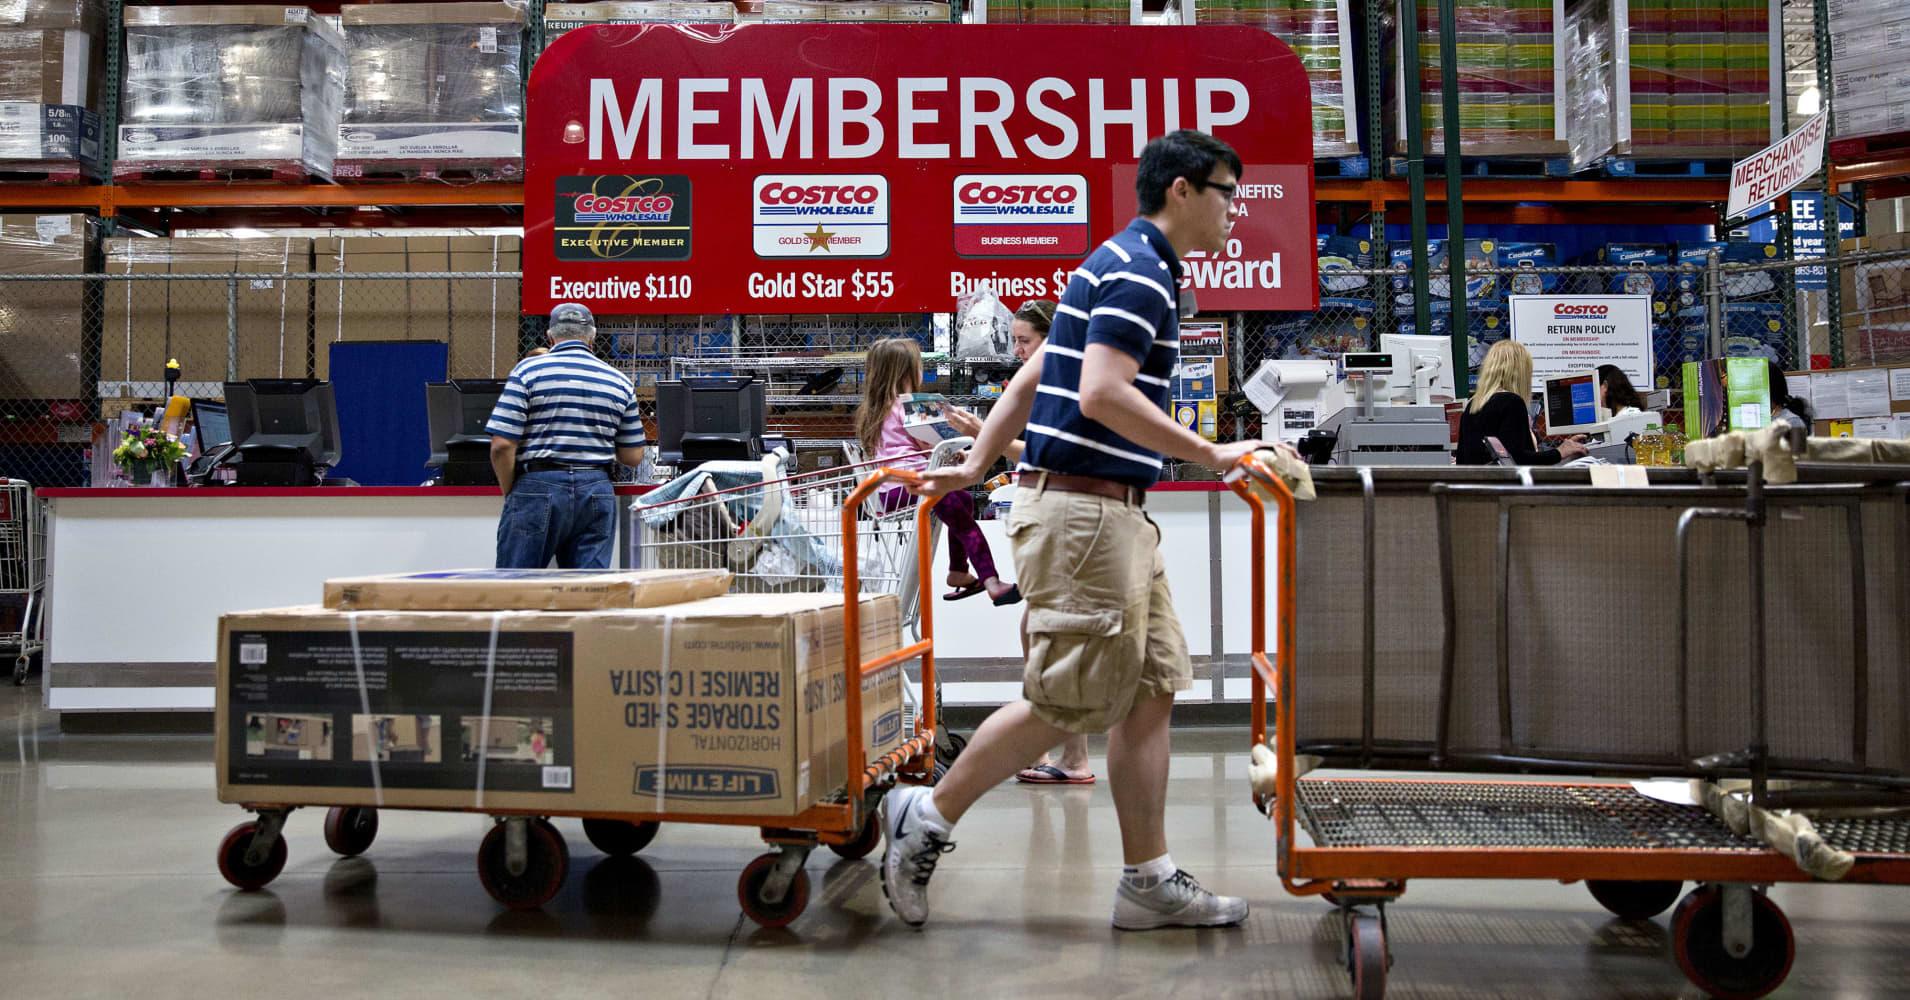 Costco may raise its membership fees, UBS says